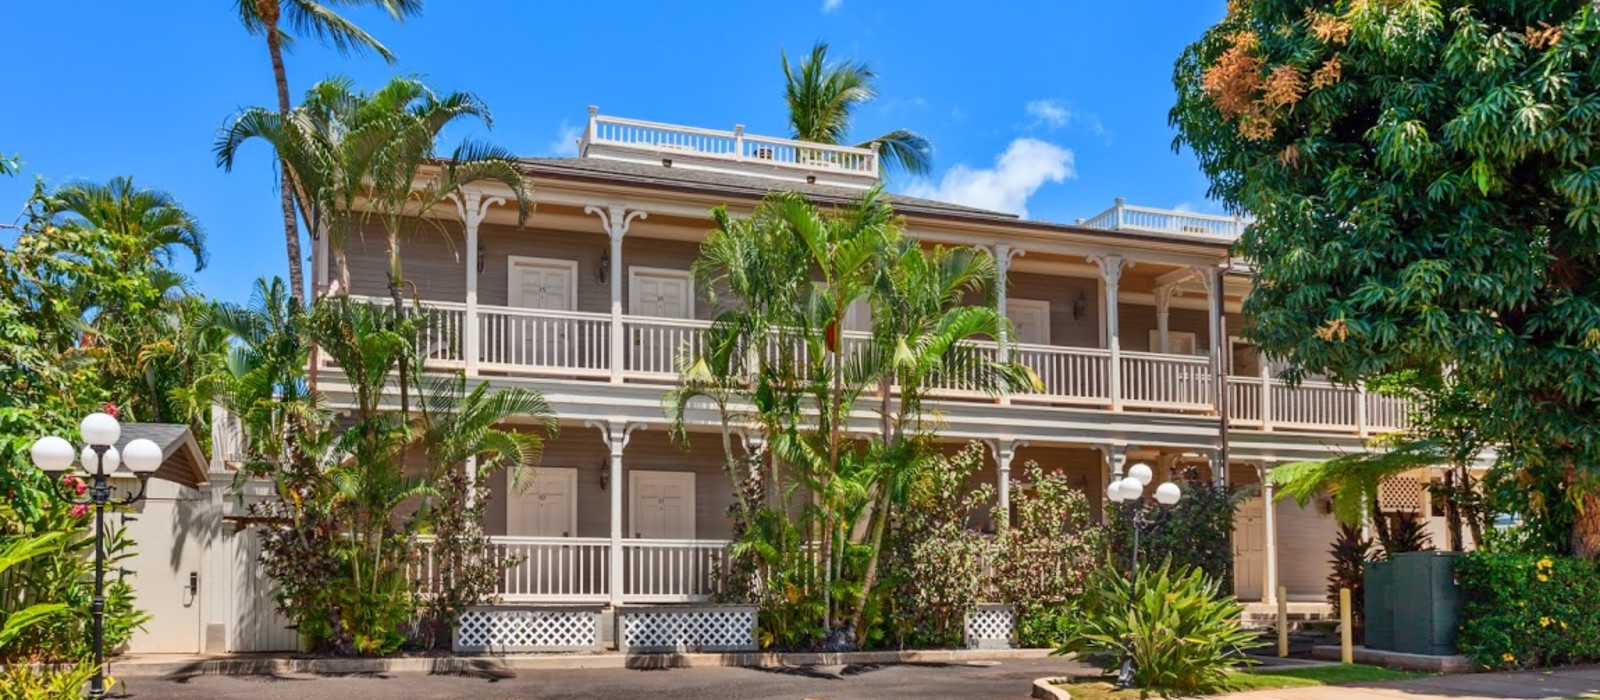 Hotel Plantation Inn Hawaii